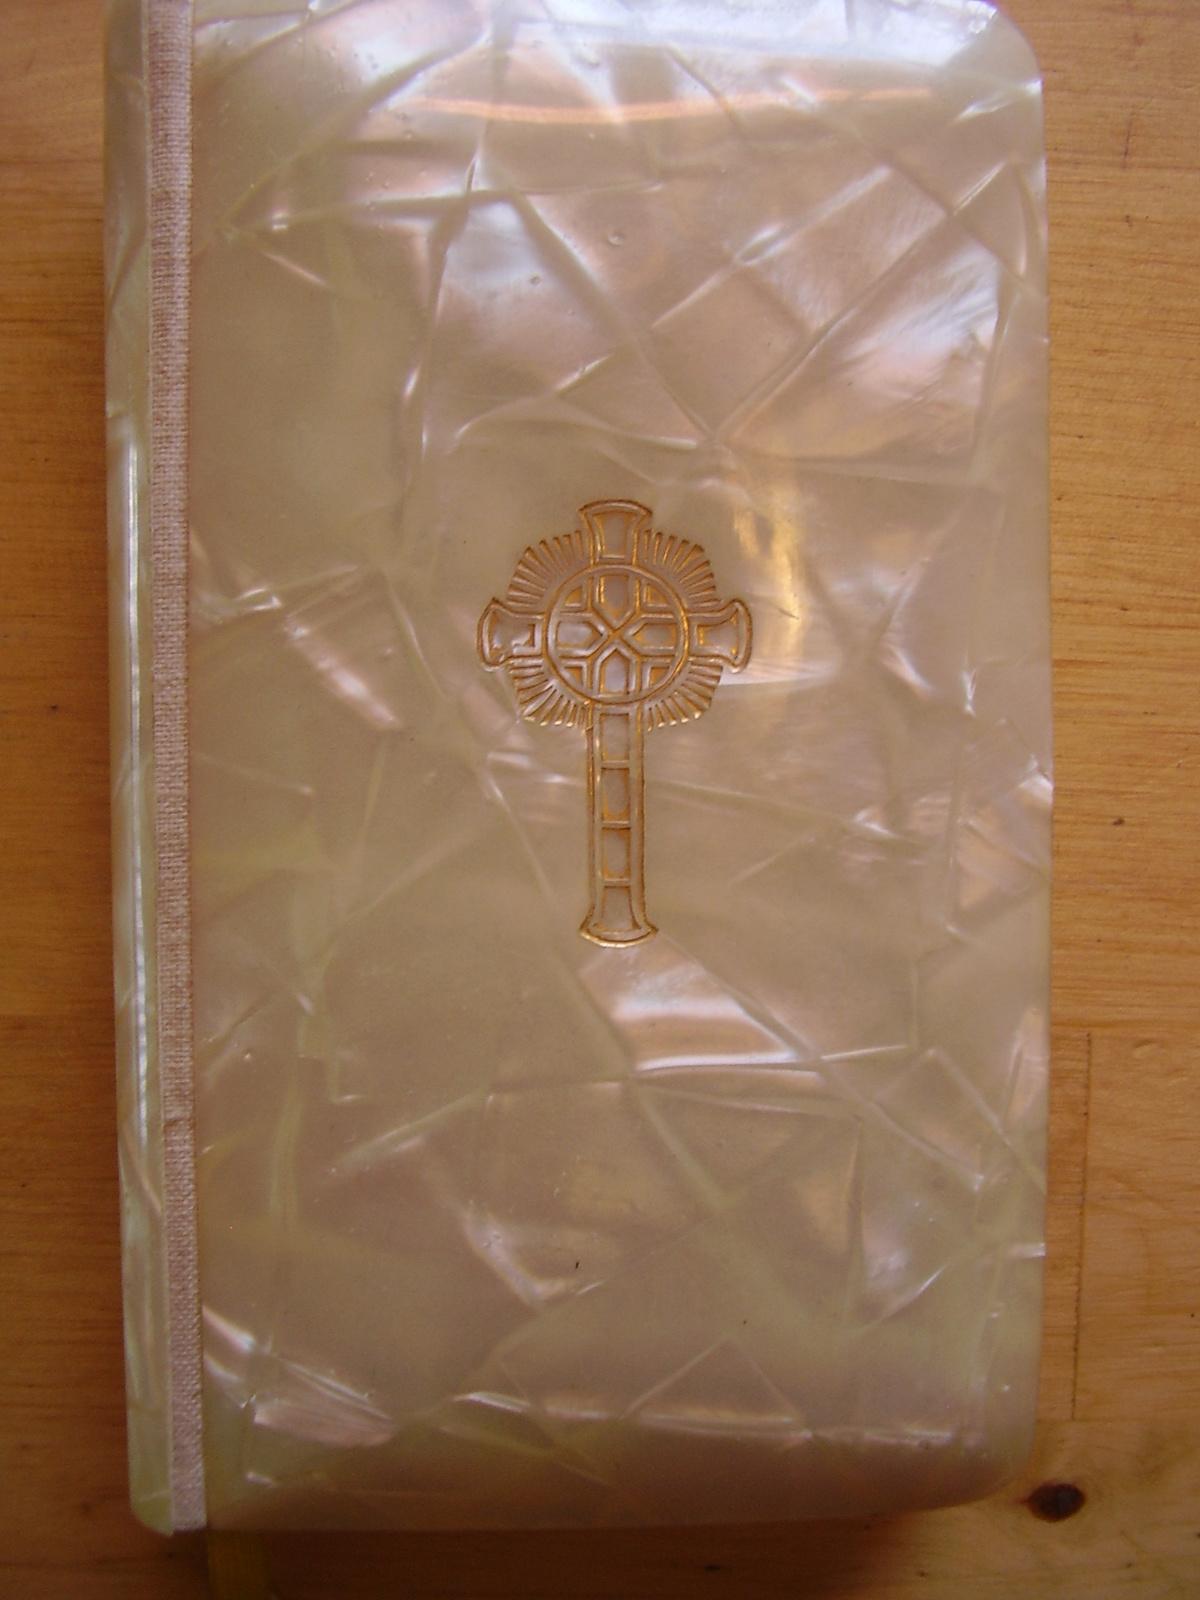 Roman Missal - Rare Antique Edition